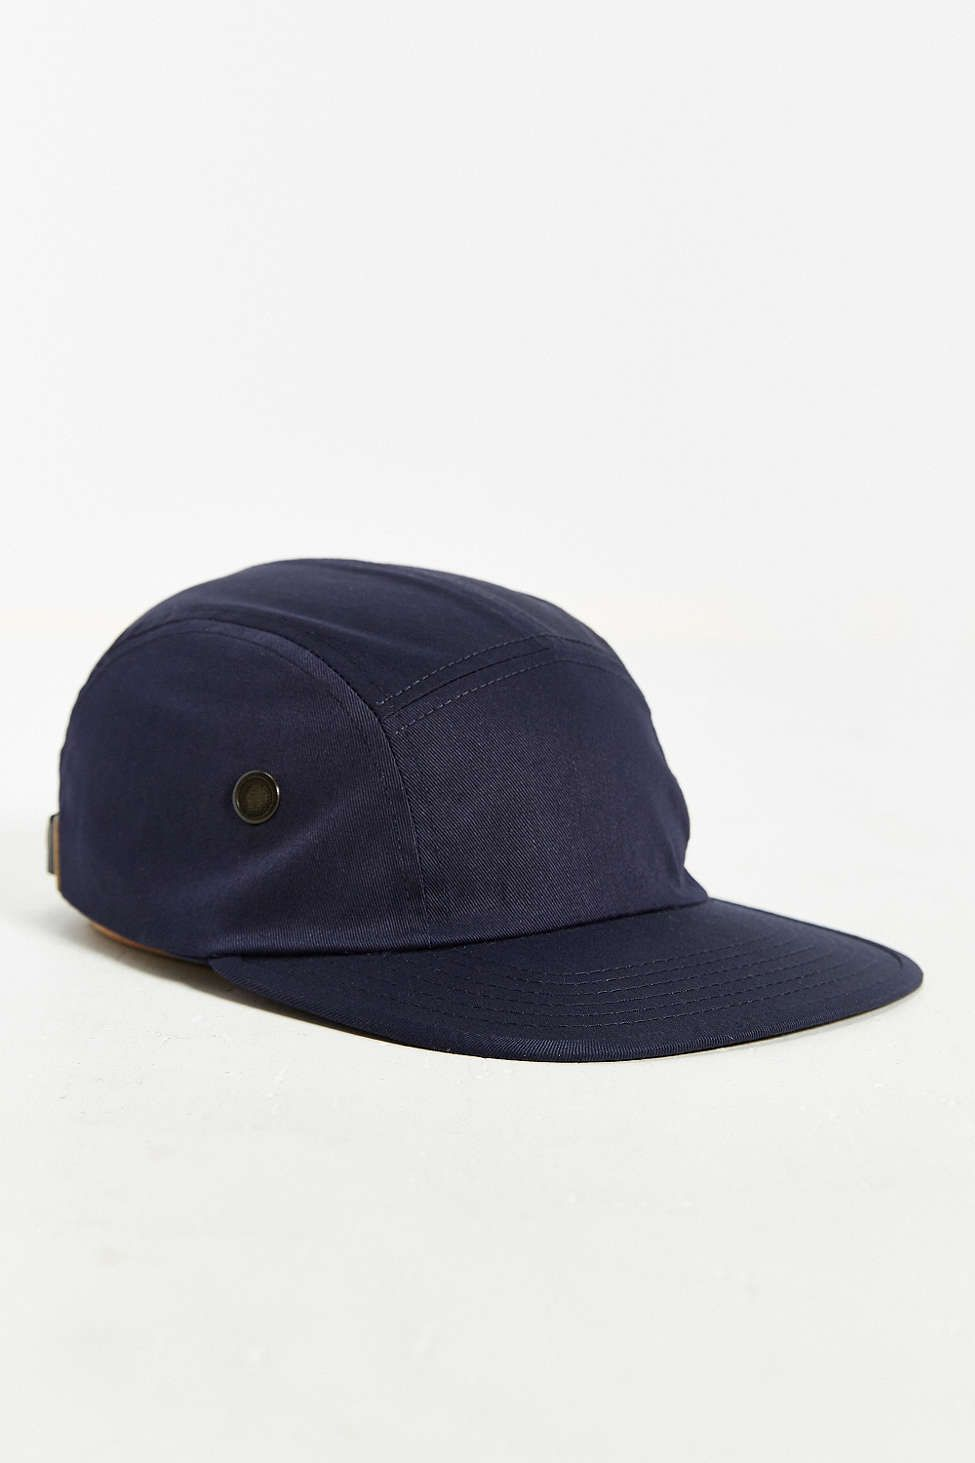 08ffe97b90508 Rothco 5-Panel Military Hat